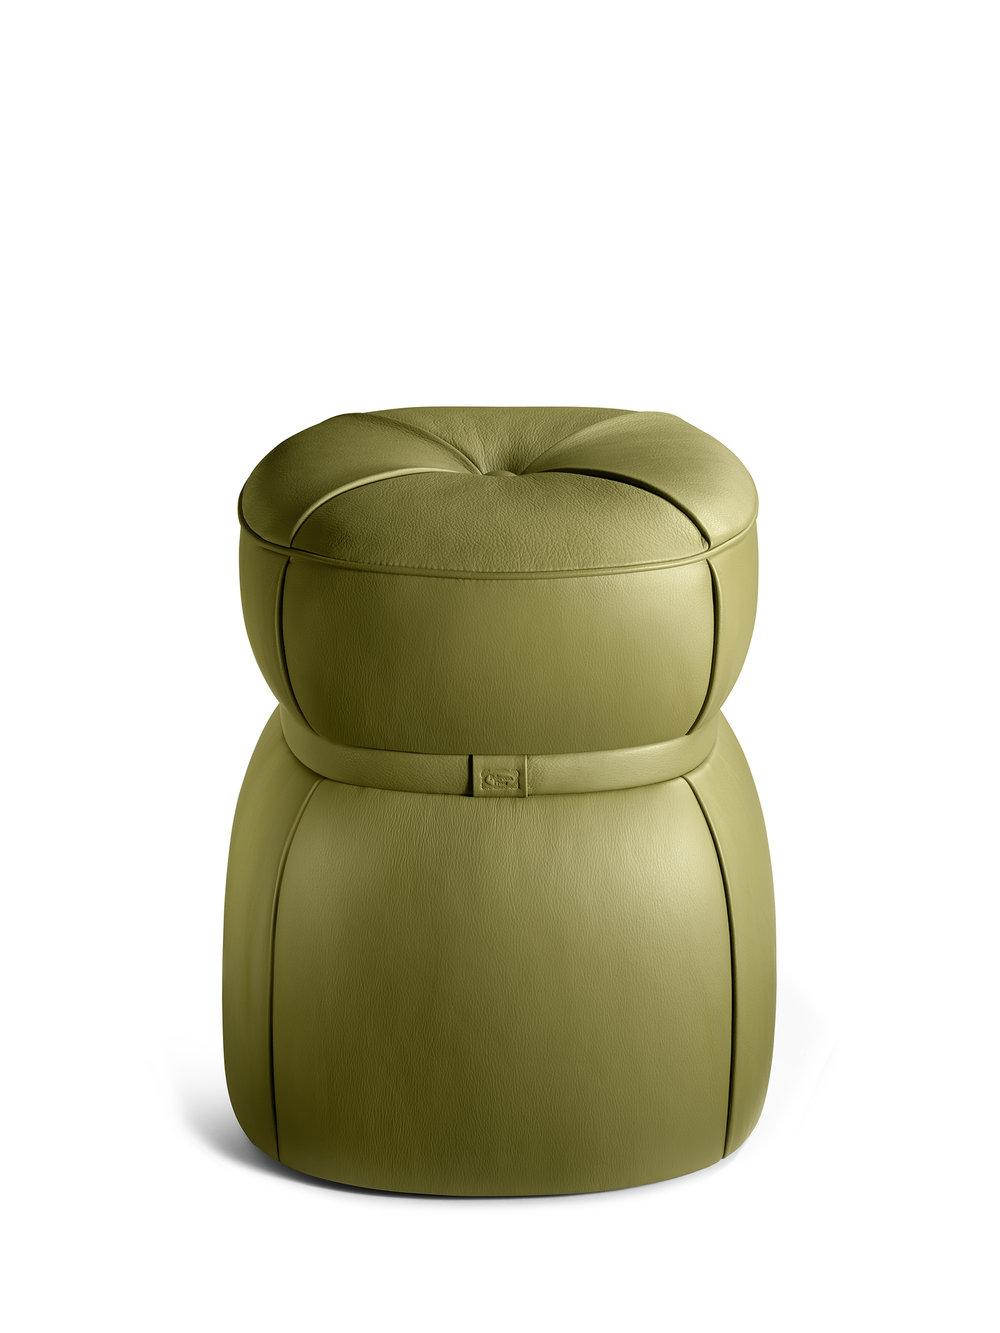 Leply Pouf designed by Kensaku Oshirol for  Poltrona Frau  ©  Oriani Origone